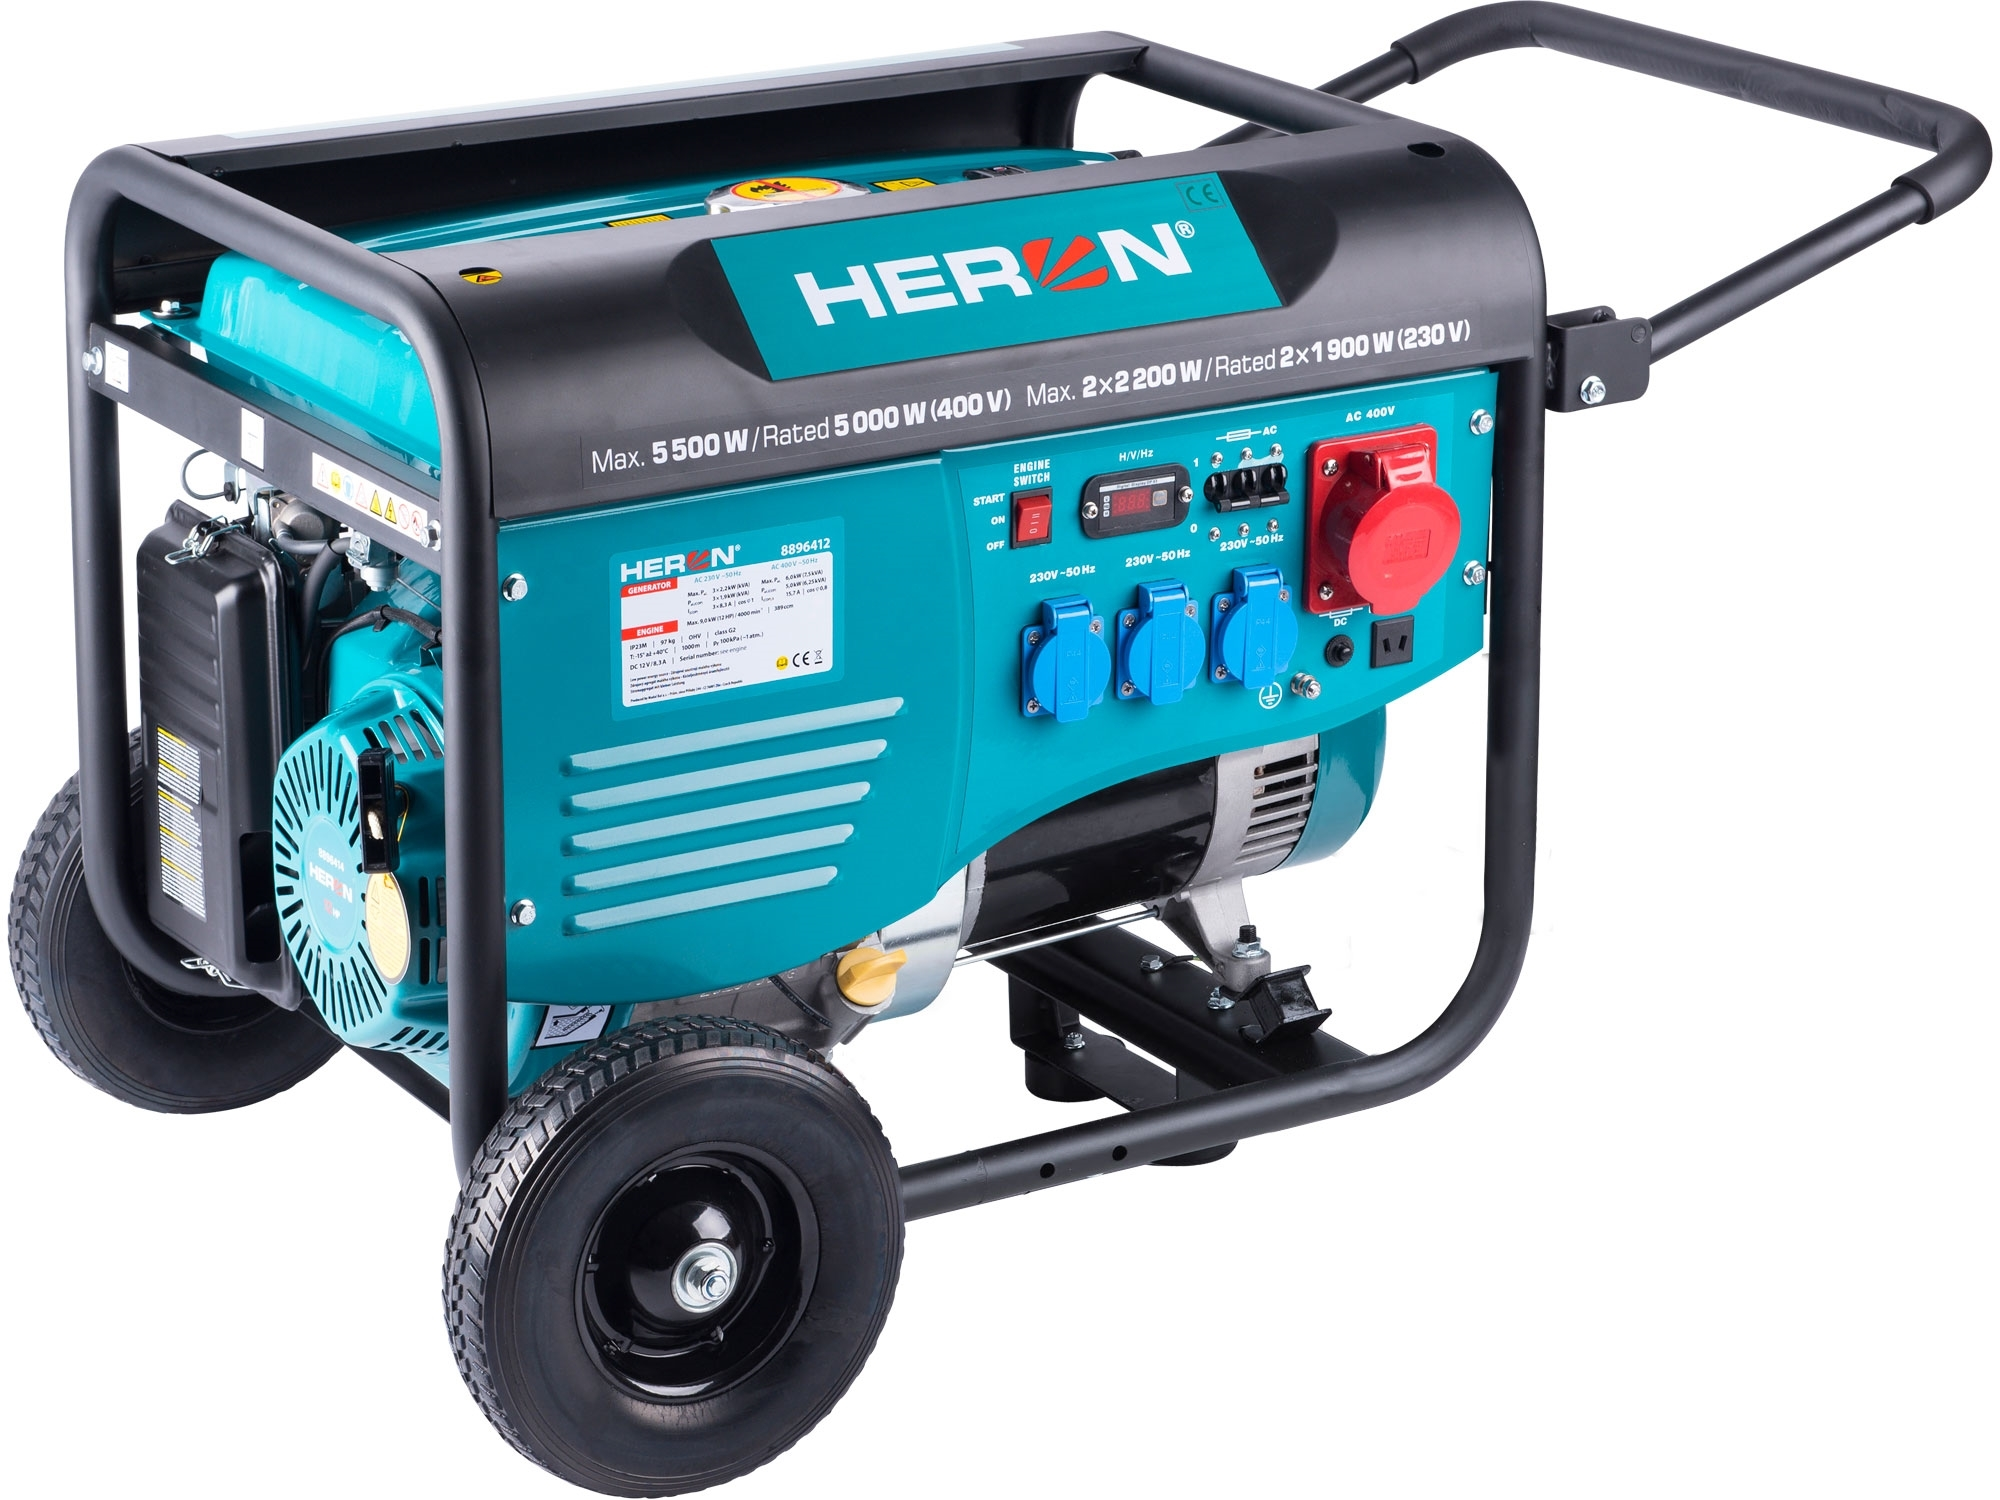 HERON elektrocentrála benzínová 13HP/5,5kW/6,8kVA (400V), 2x2,2kW (230V), podvozek